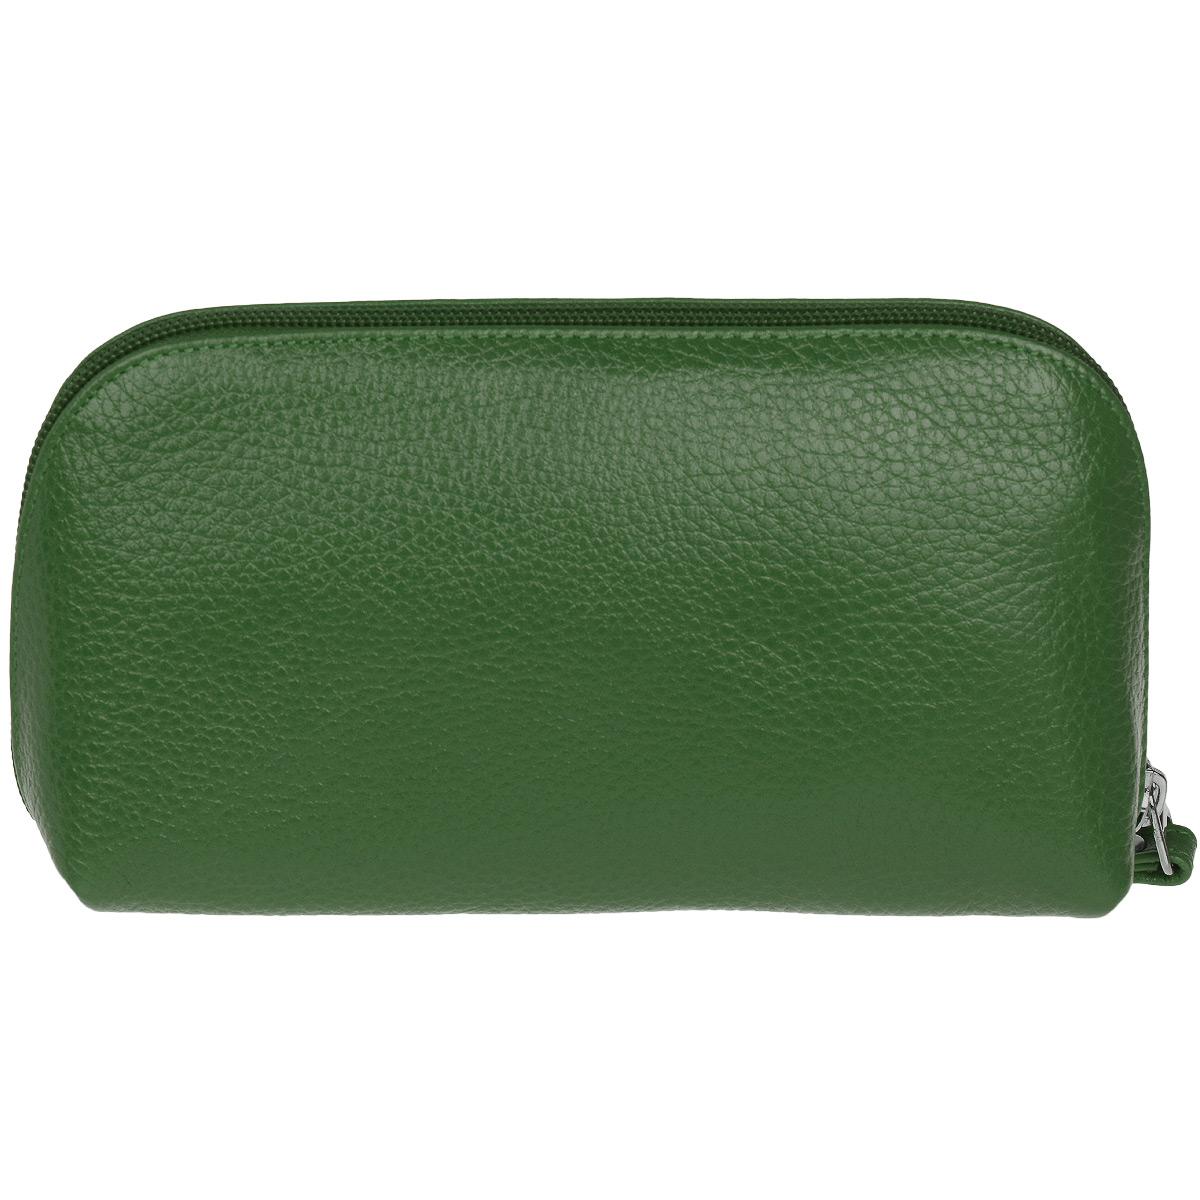 Косметичка Butun, цвет: зеленый. 657-004 075 ( 657-004 075 )